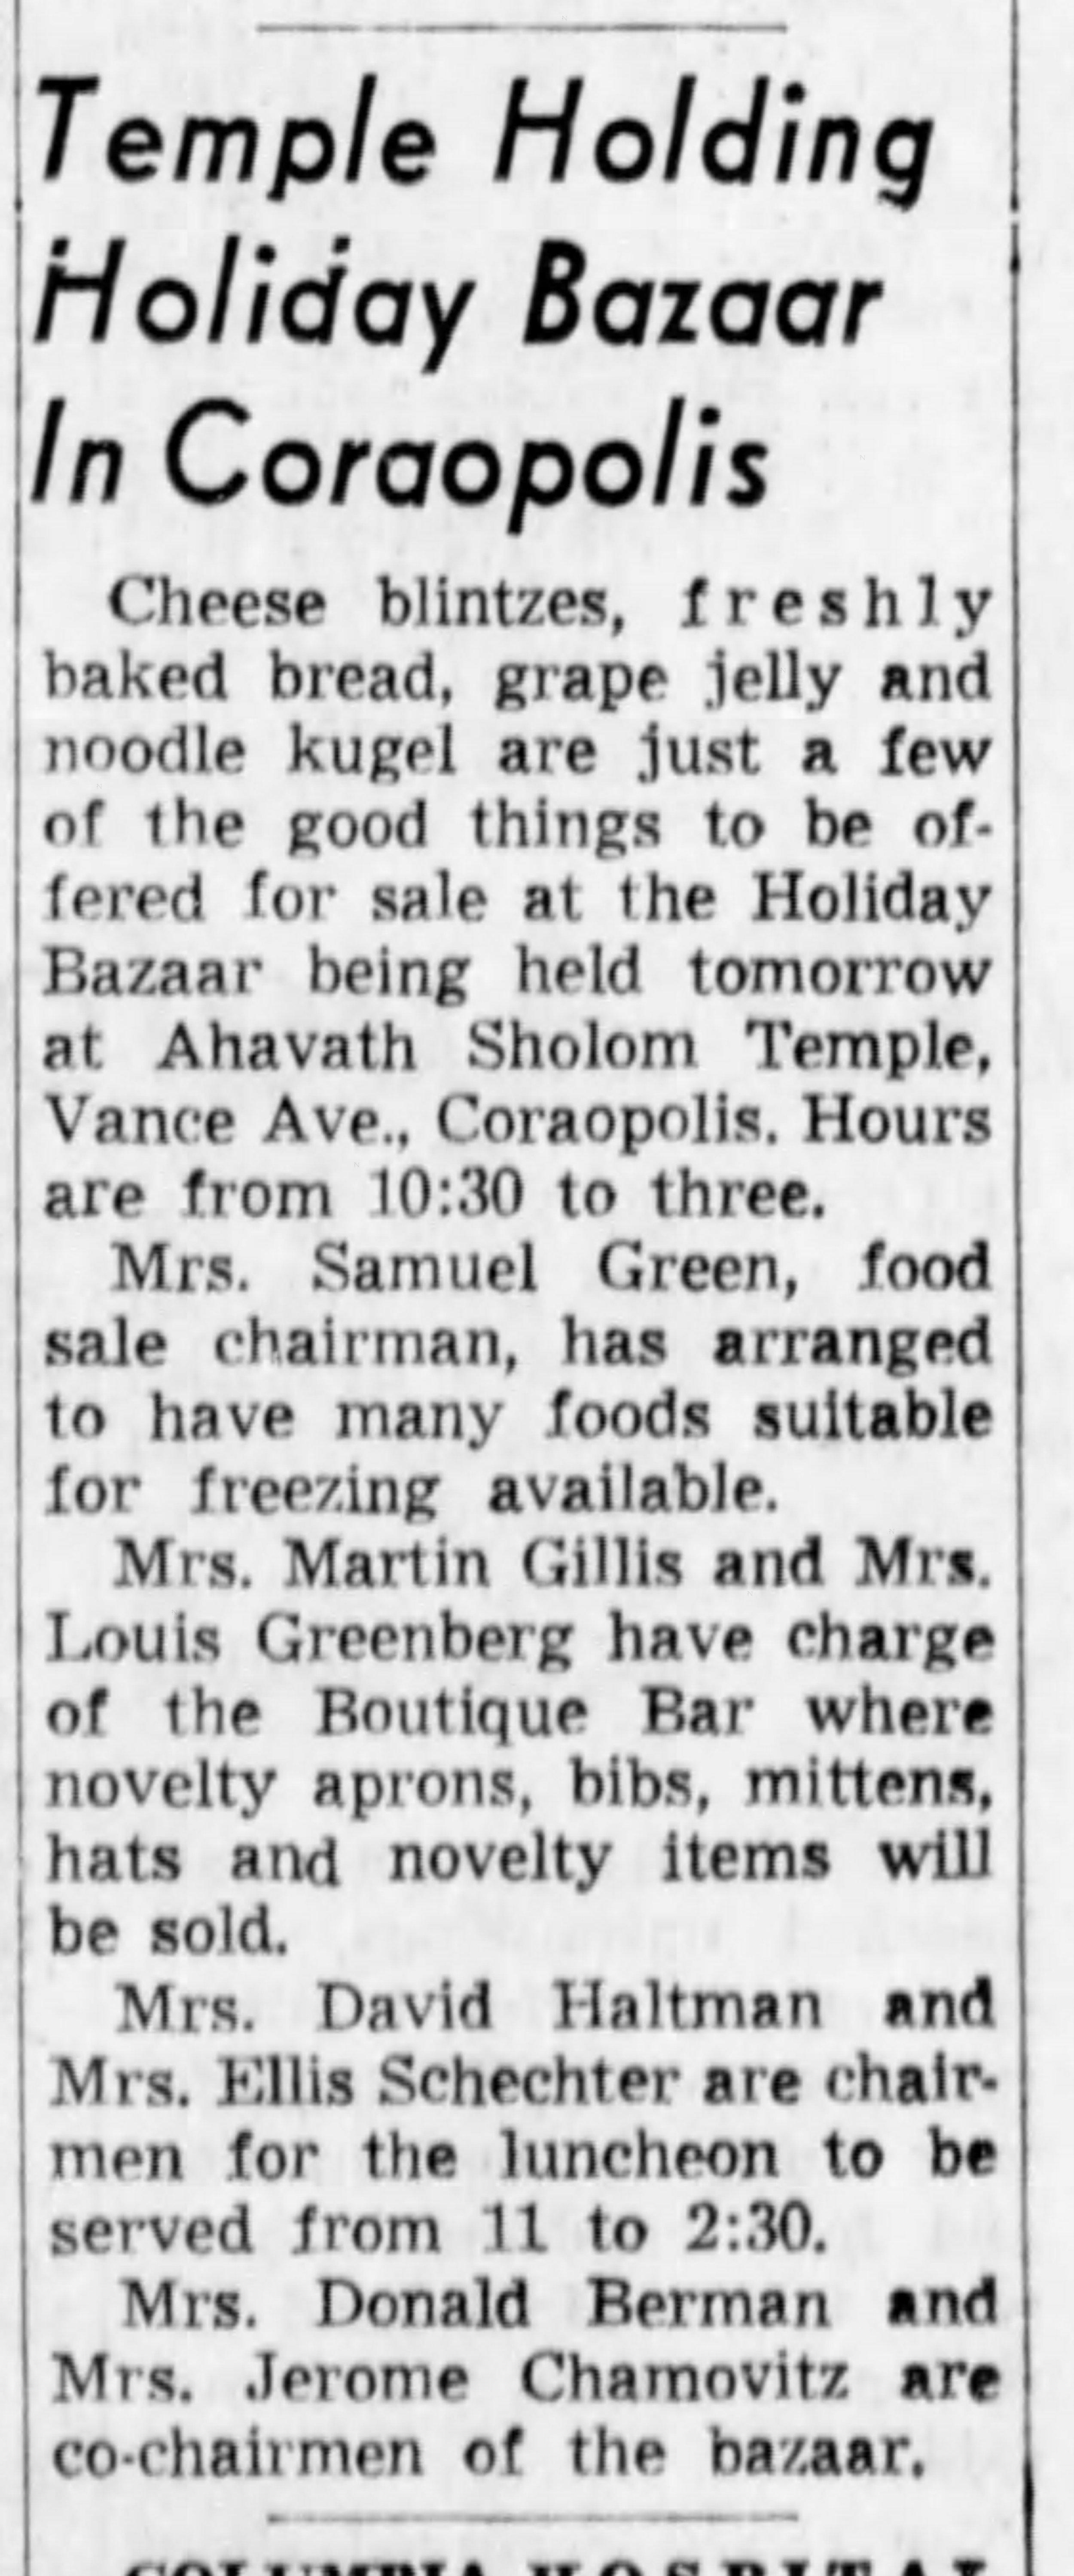 1964-11-18 Pittsburgh Post-Gazette (v38, n94, p29)